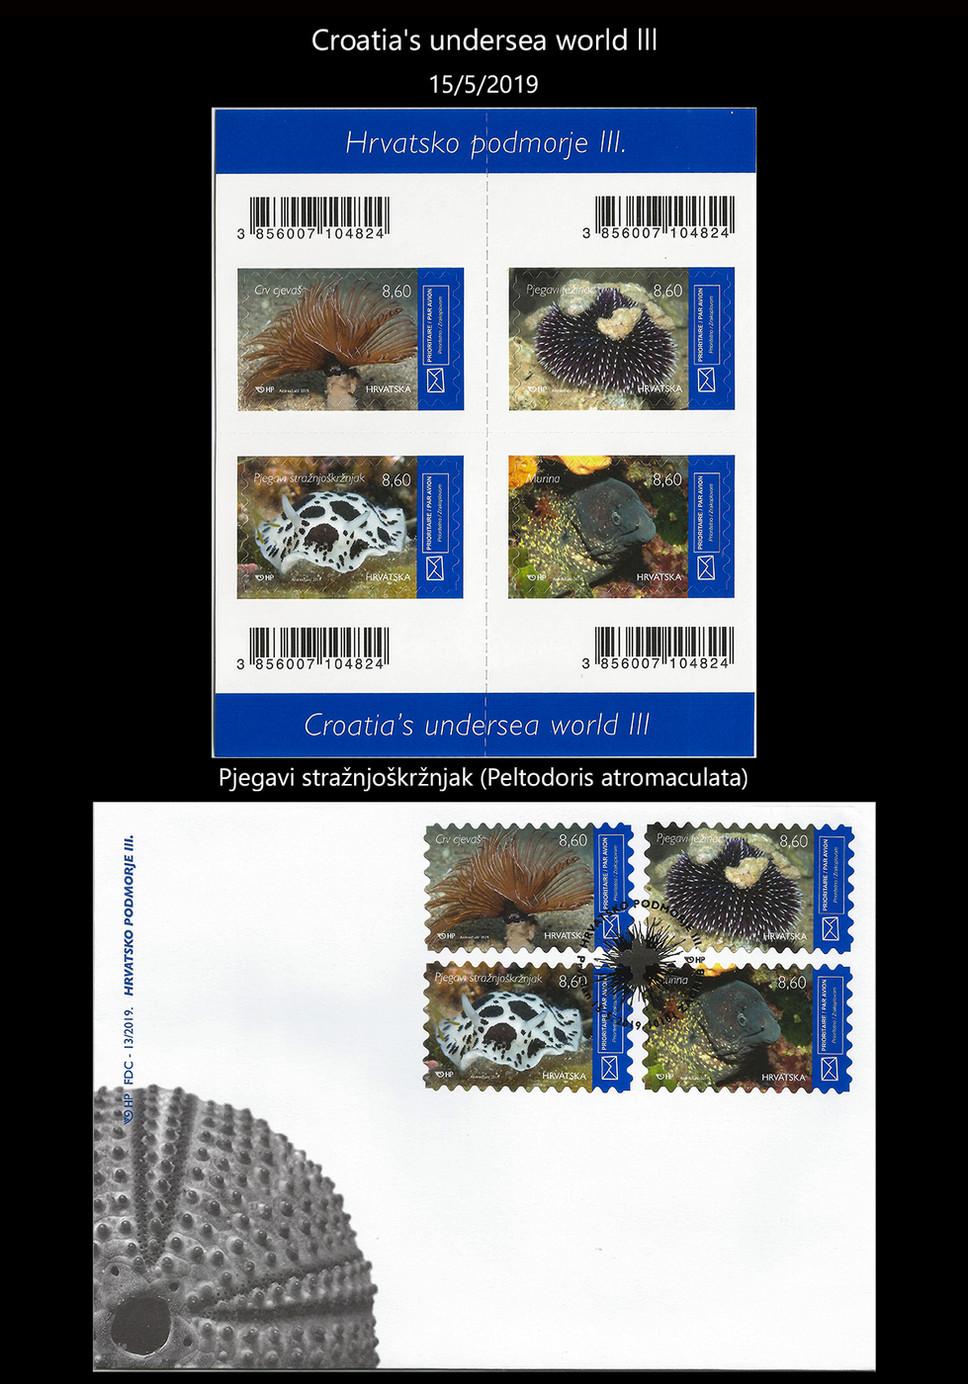 croatia 2 Stamps & FDC